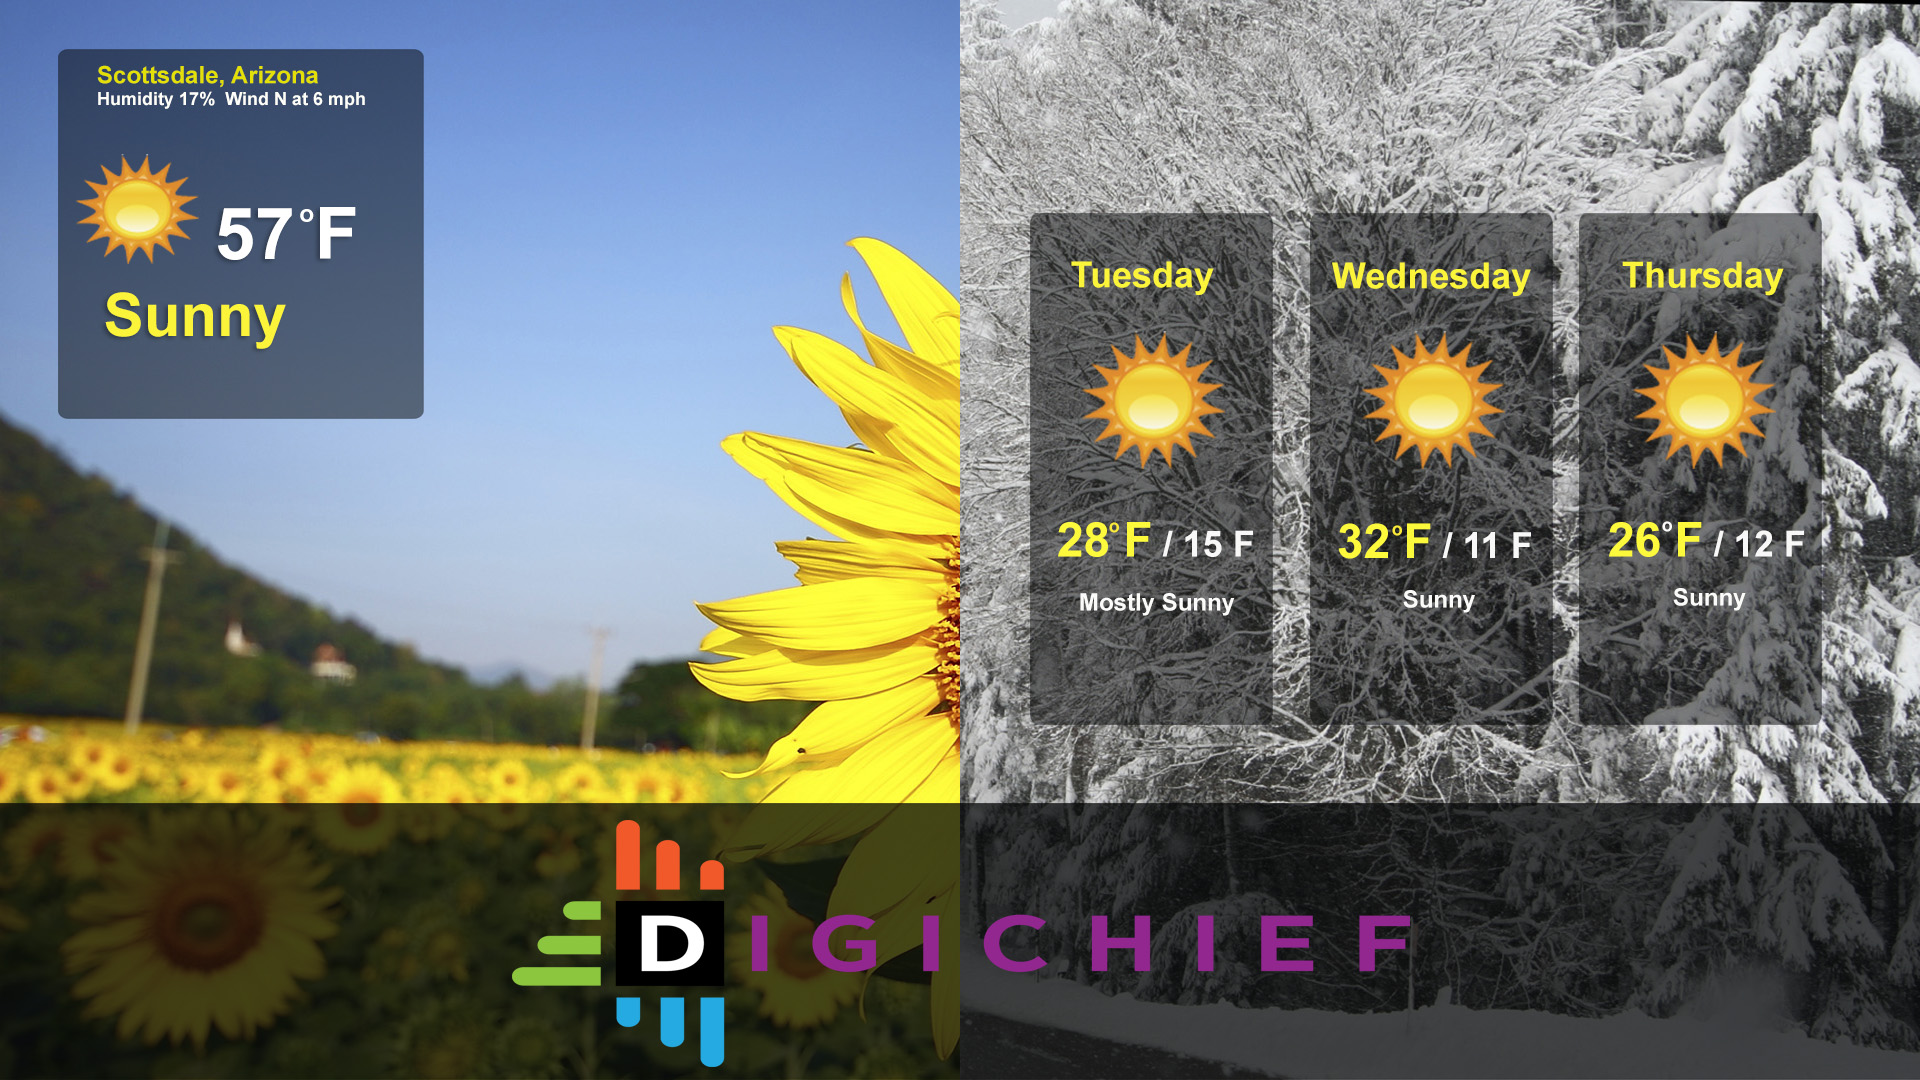 weather forecast for digital signage